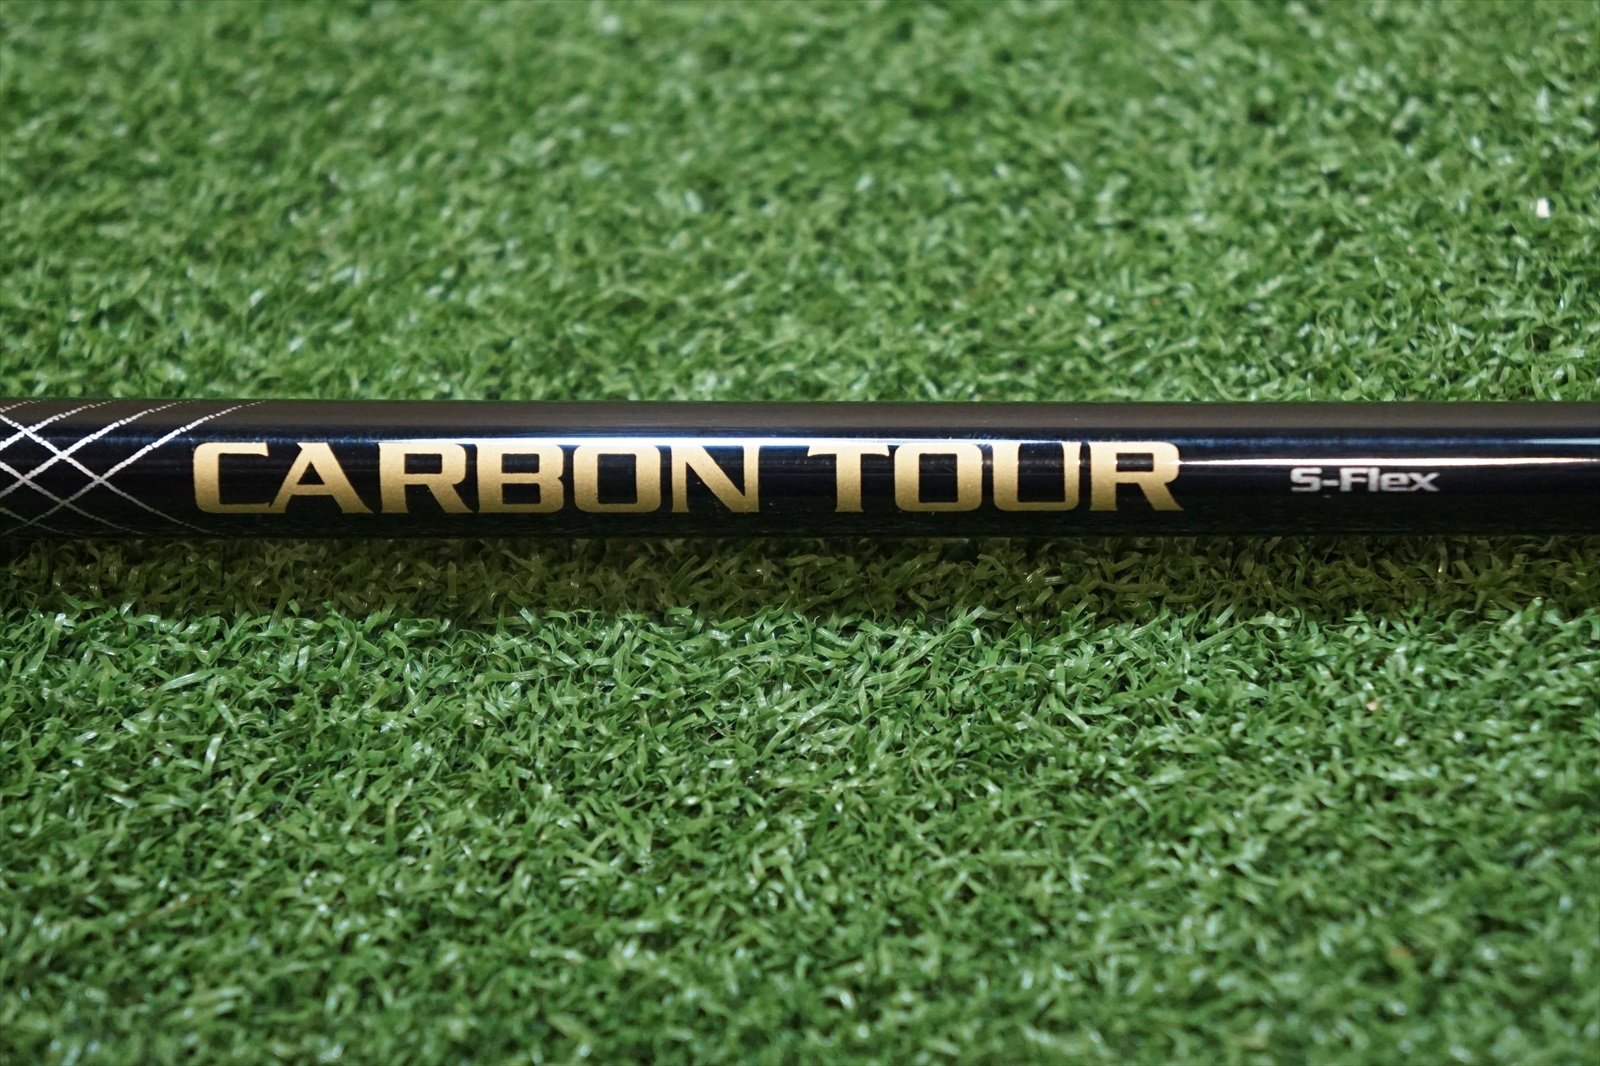 UST CARBON TOUR TFT G STIFF DRIVER SHAFT PULL .335 45 654681